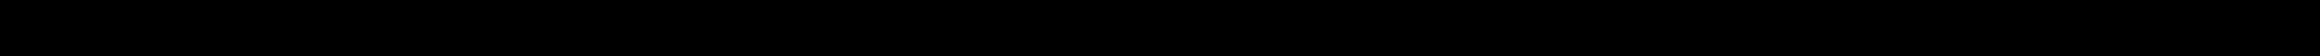 DIEDERICHS 84701-62J100-5PK, 84701-62J20-ZCE Retrovisor exterior